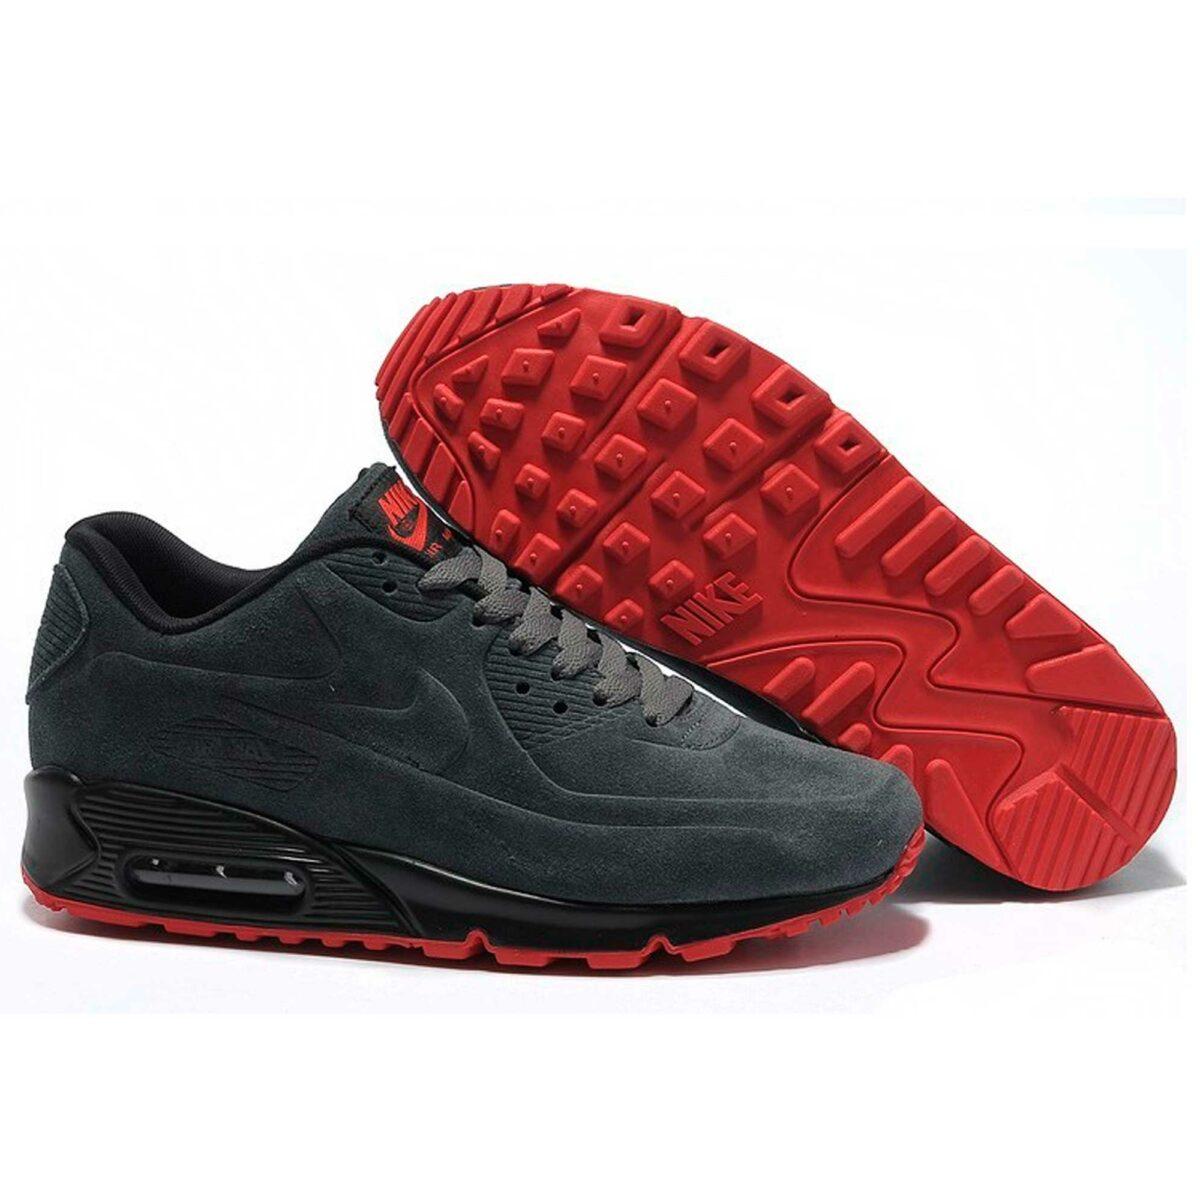 nike air max 90 VT grey red 472489-001 купить